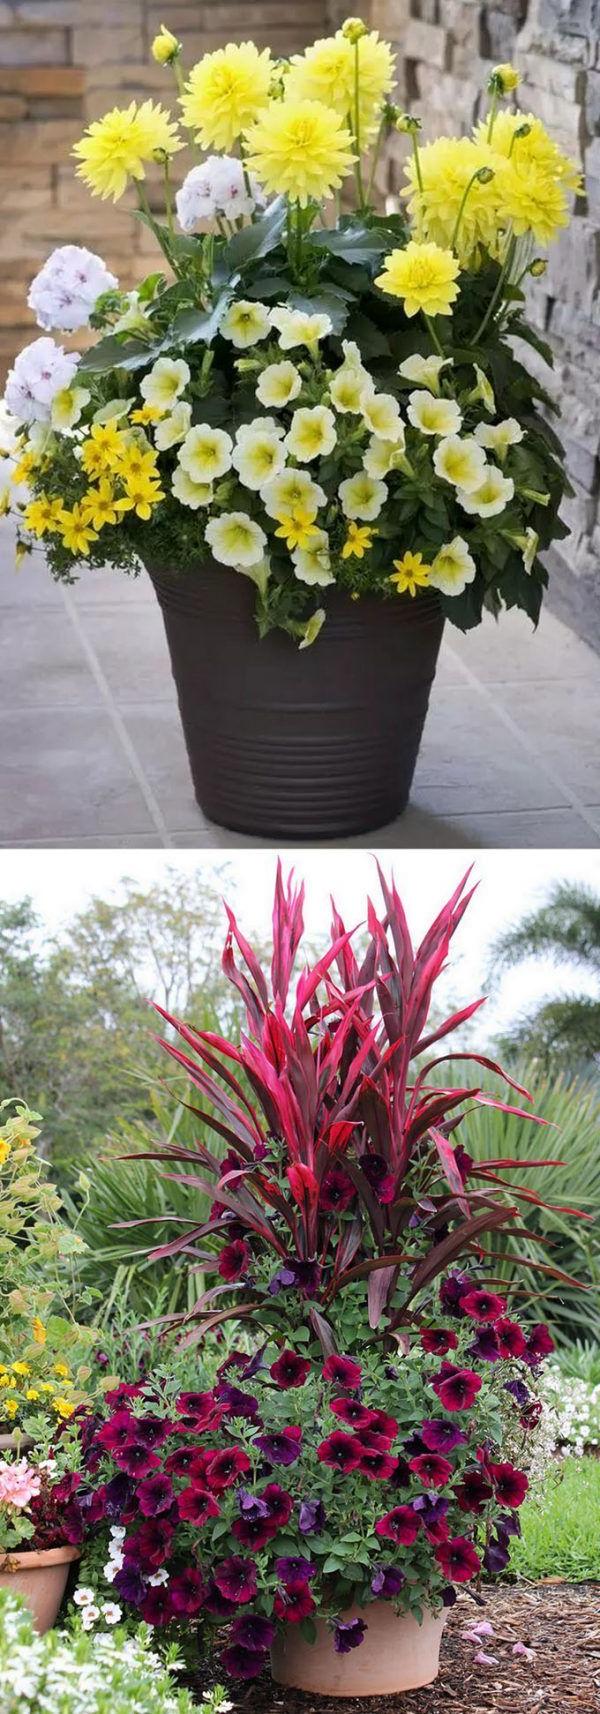 24 Stunning Container Garden Planting Ideas Plants